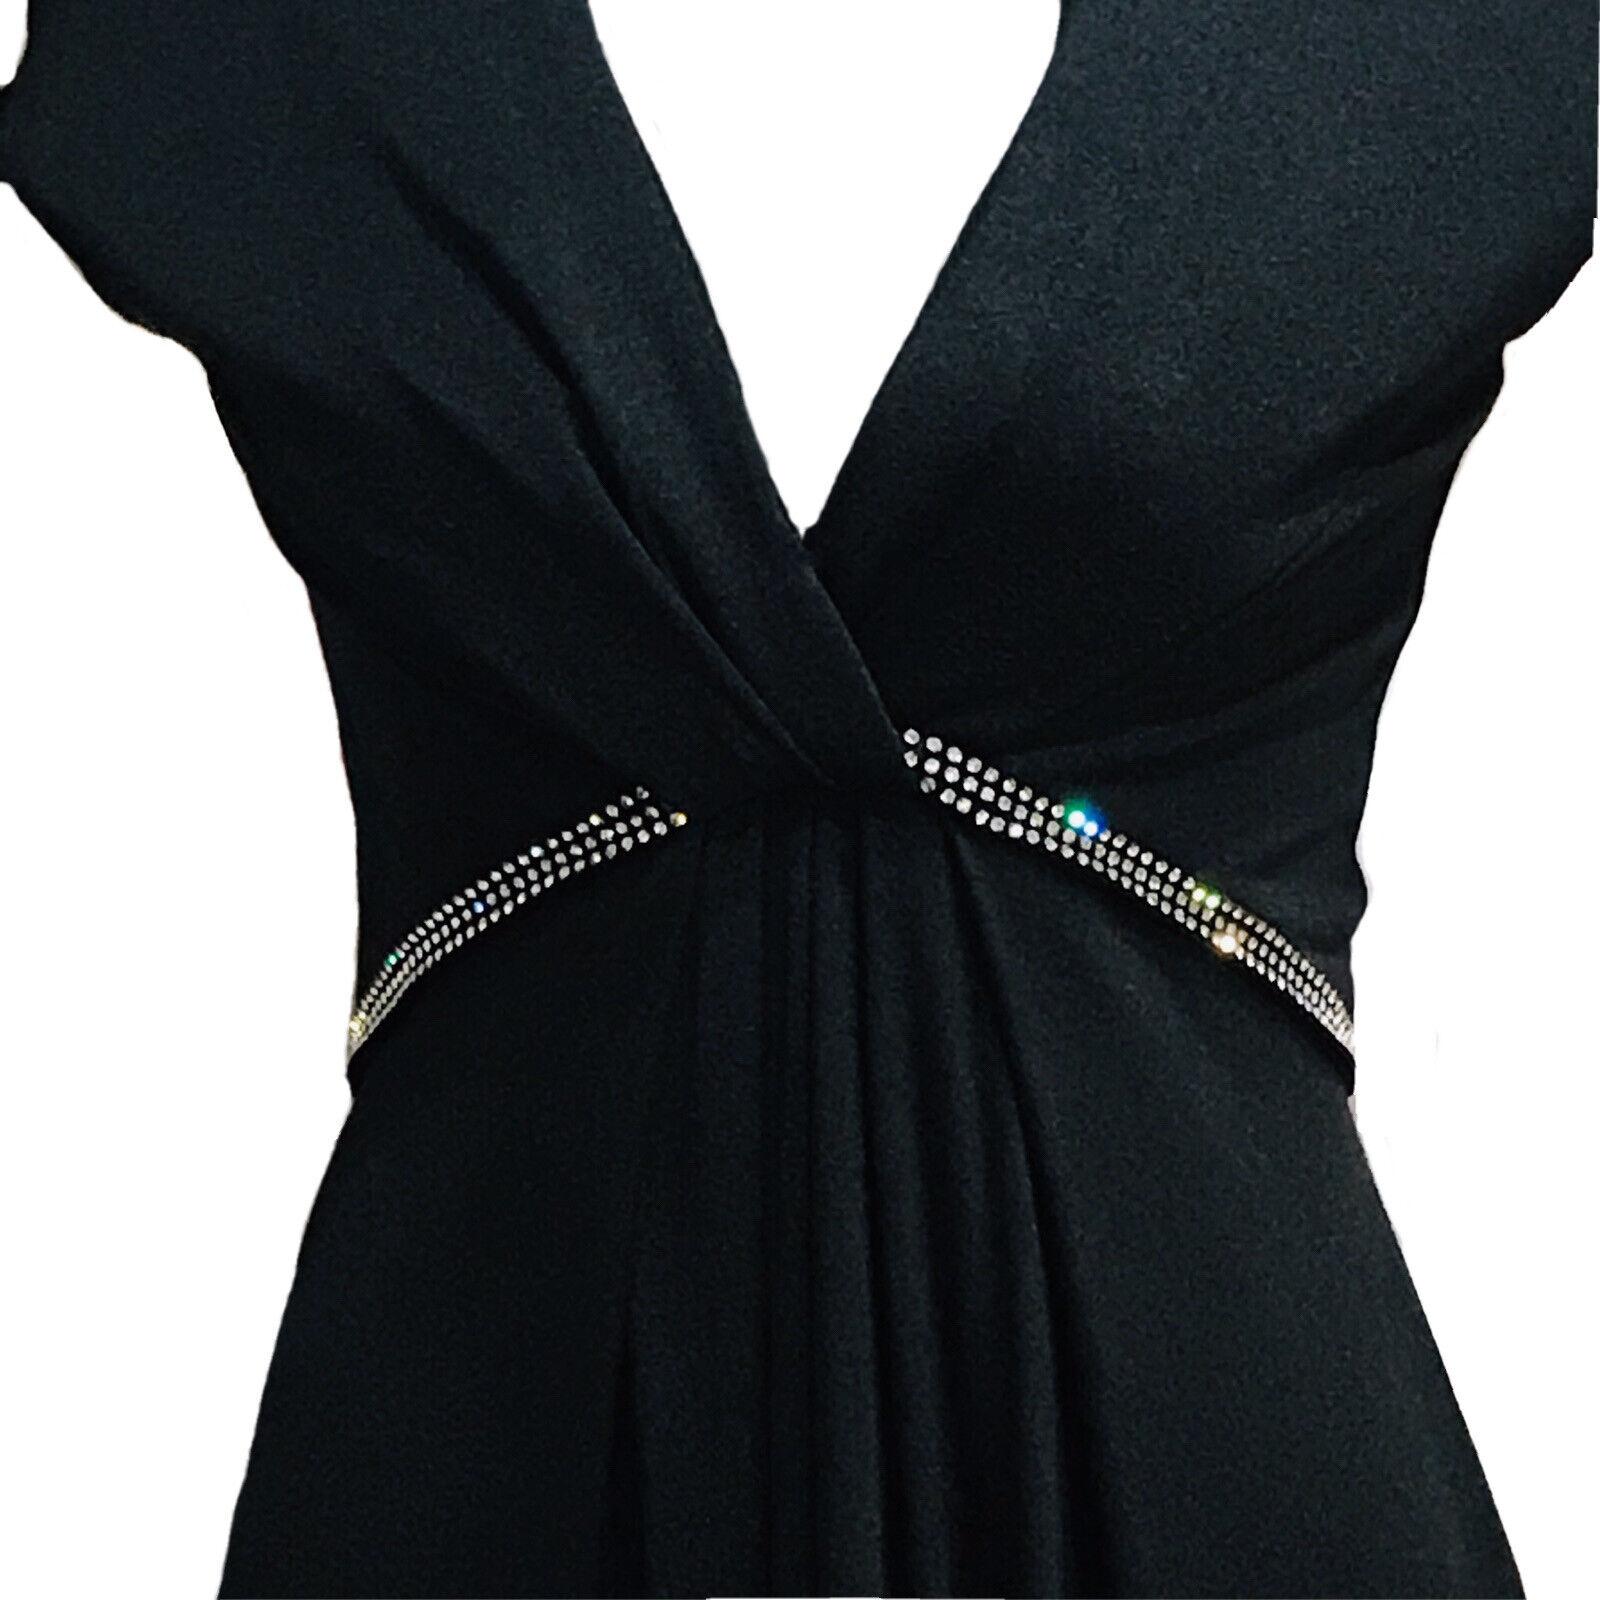 Vintage Luis Estevez Dress Eva Gabor Look Label B… - image 11